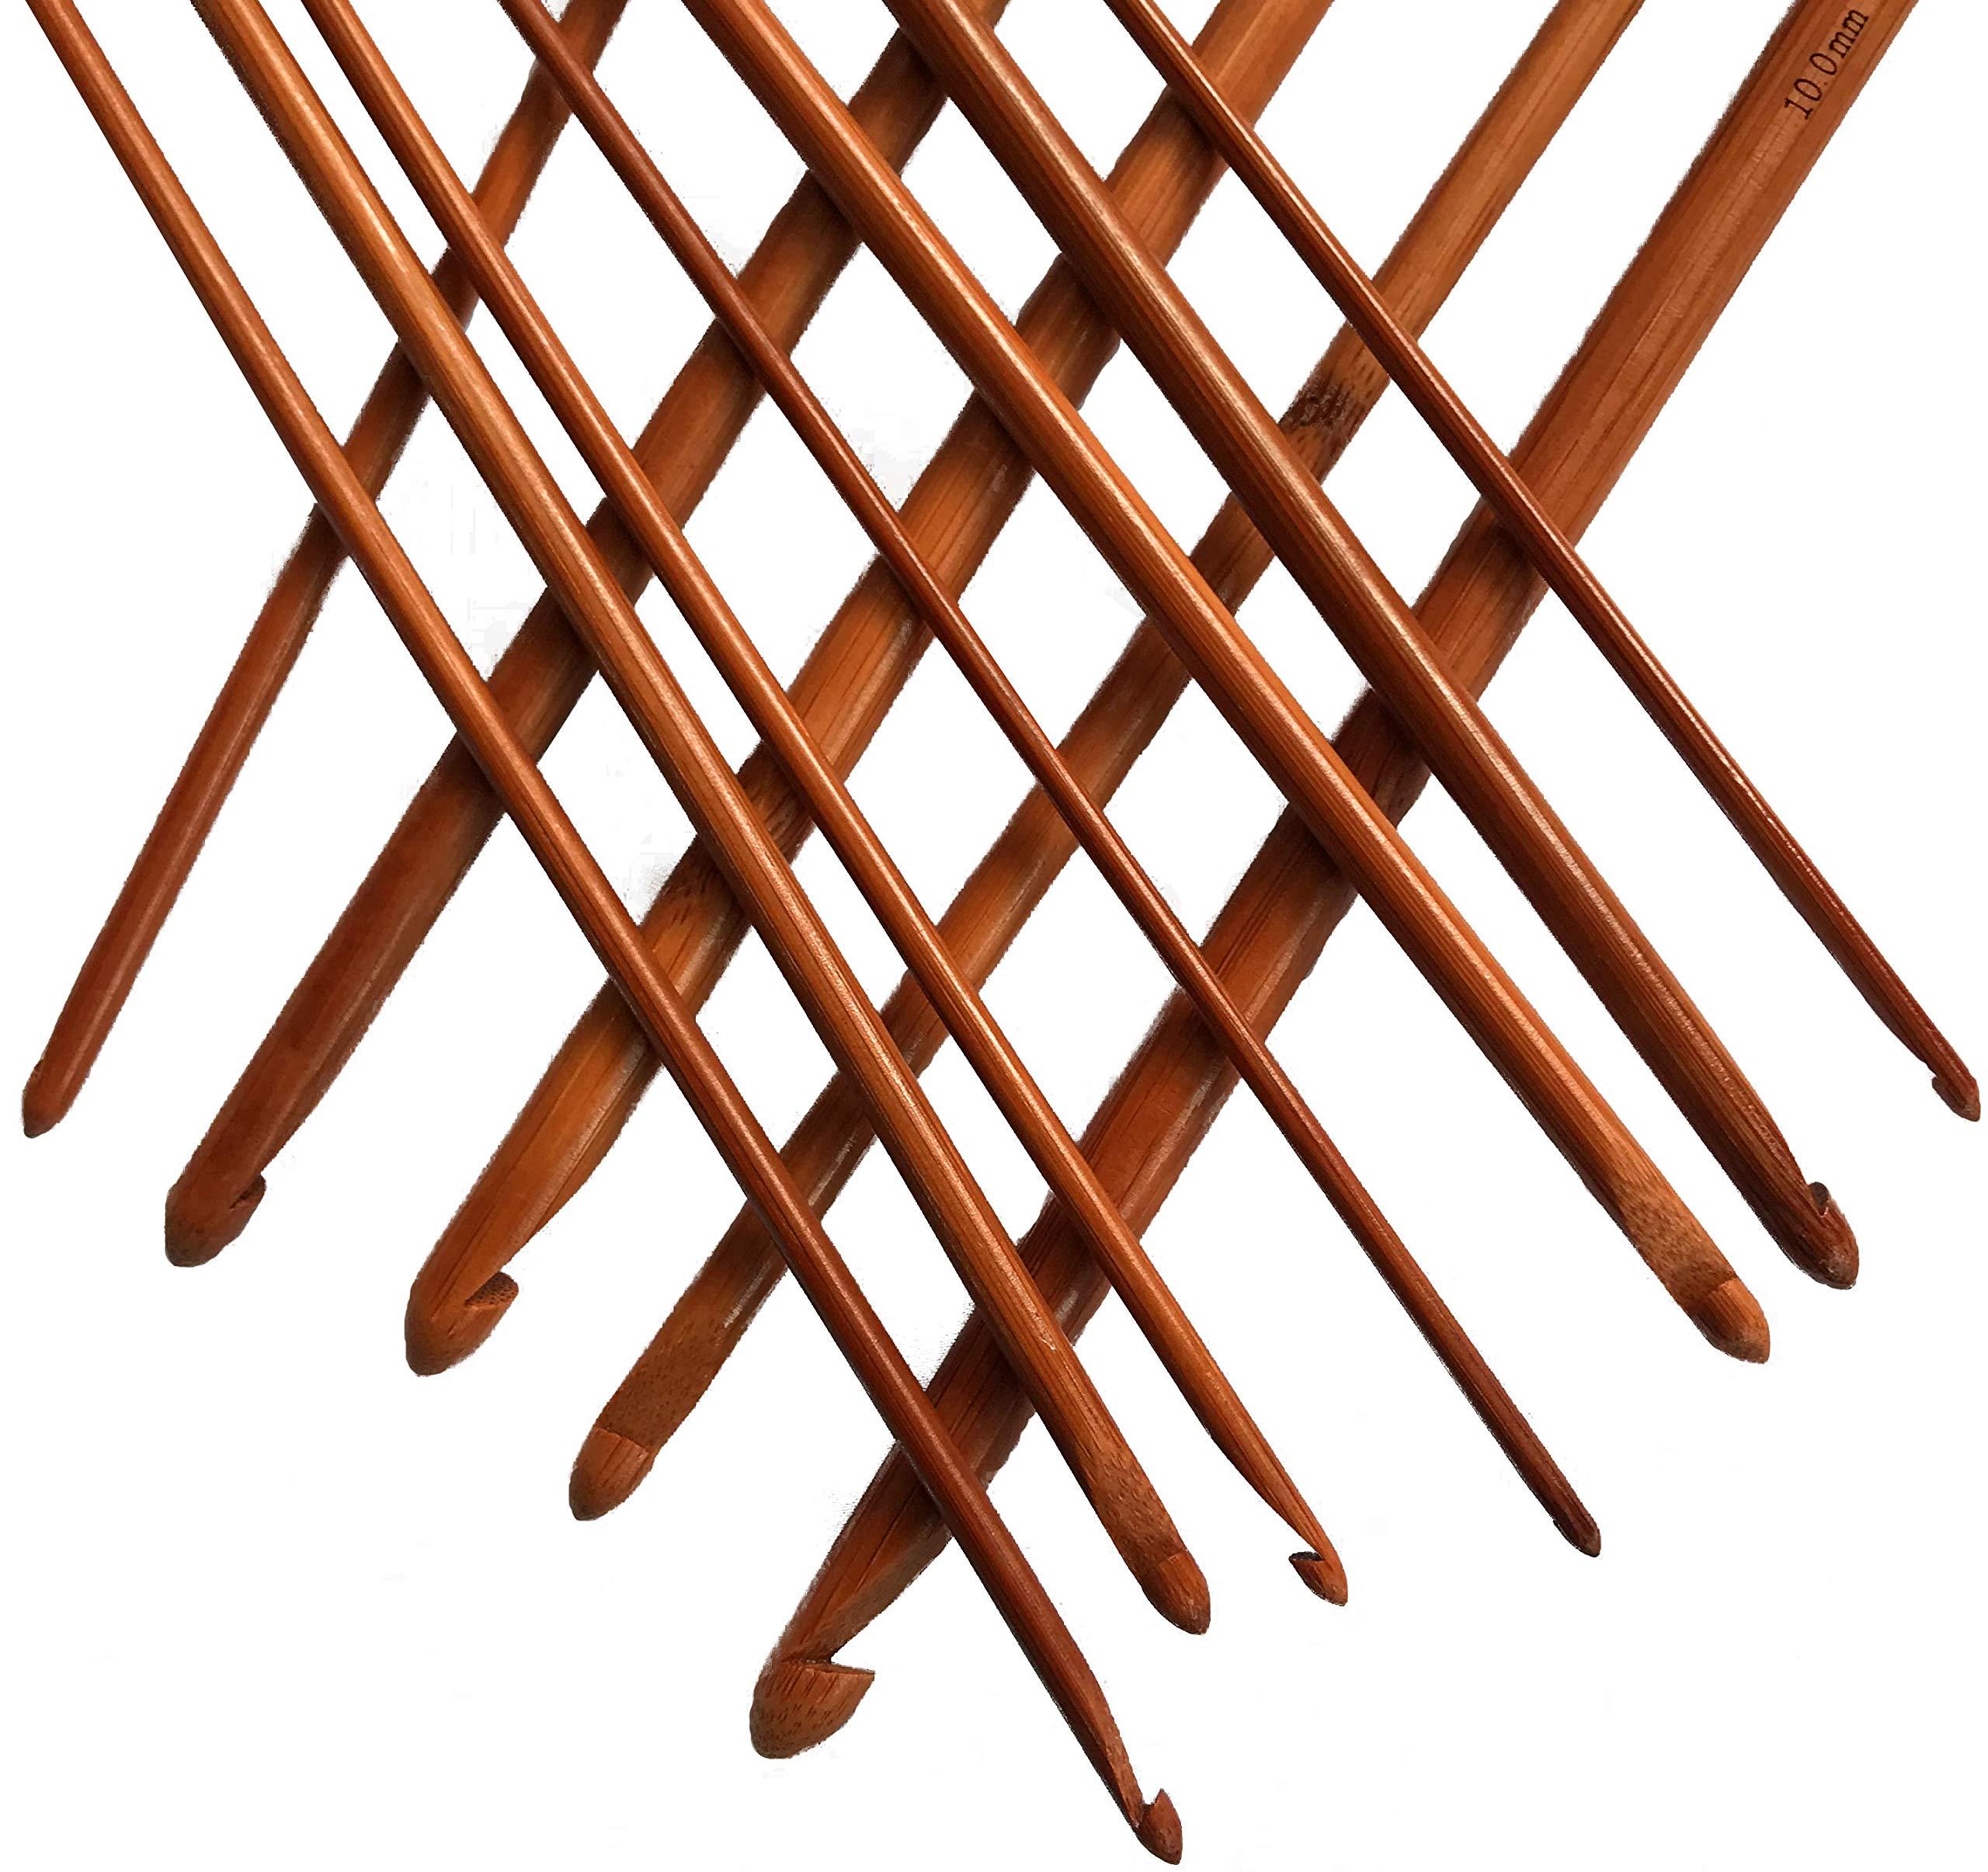 Tunisian Crochet Hooks Set Afghan Crochet Hook Tunisian Crochet Needles Bamboo 3 3.5 4 4.5 5 5.5 6 6.5 7 8 9 10 by Athena YY (Image #3)